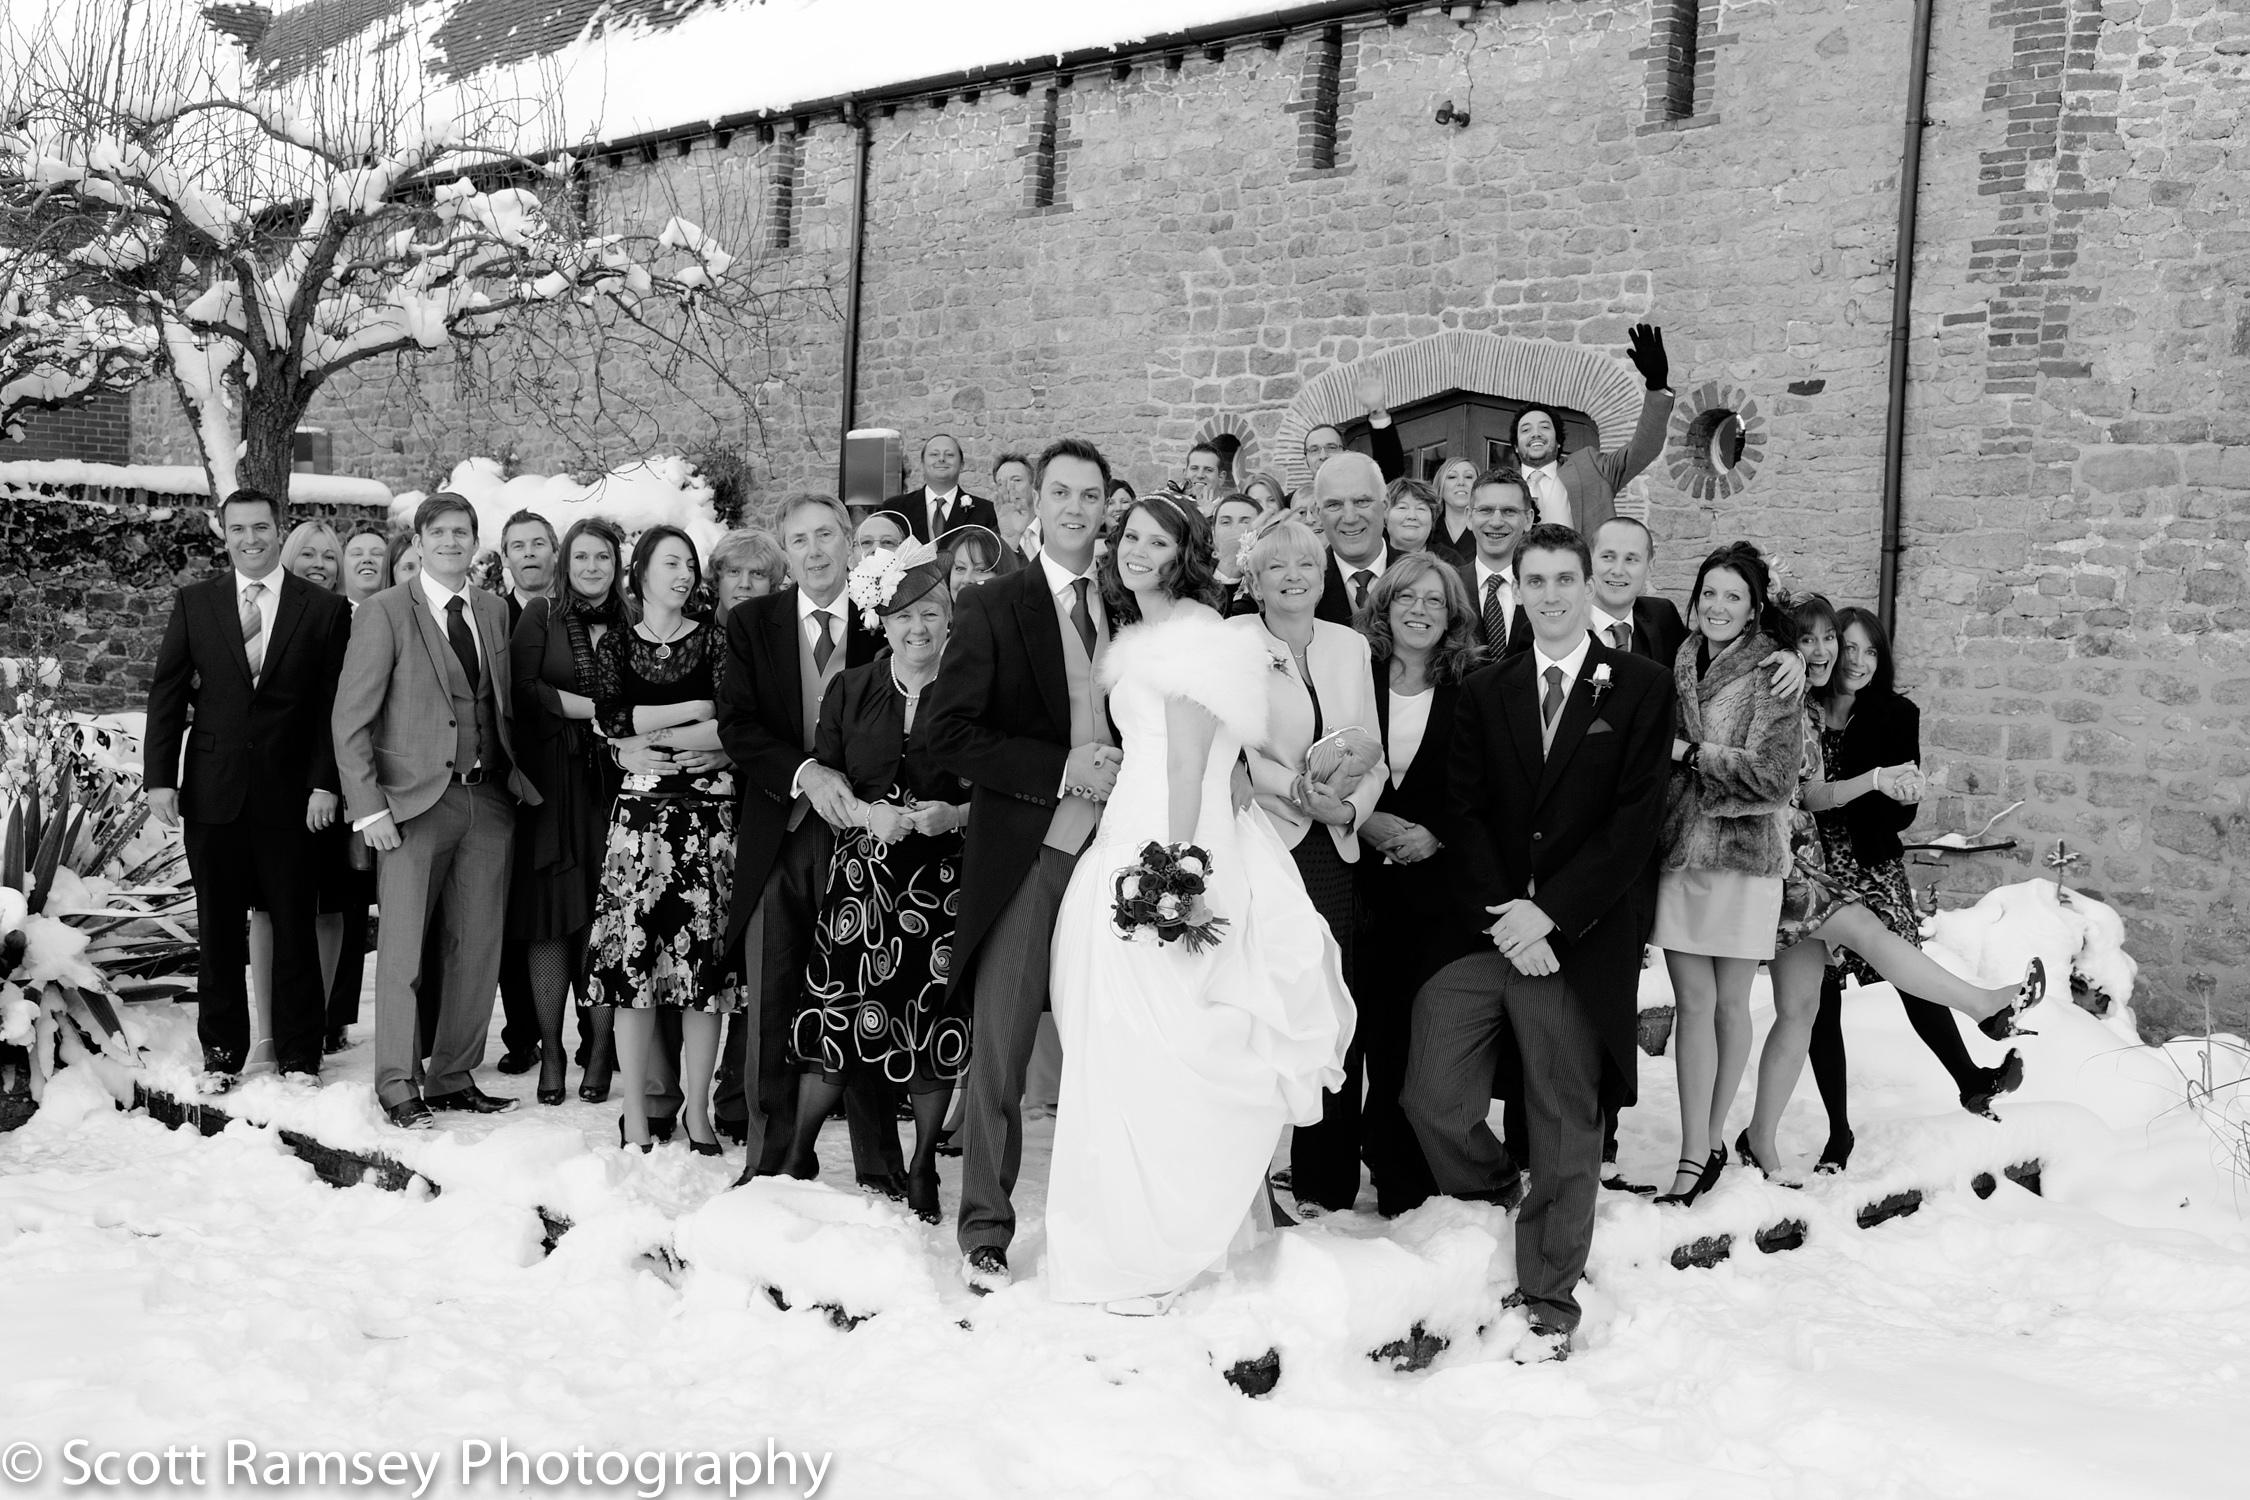 Winter-Wedding-Spread-Eagle-Hotel-Midhurst-Fun-Snow-Wedding-Grou